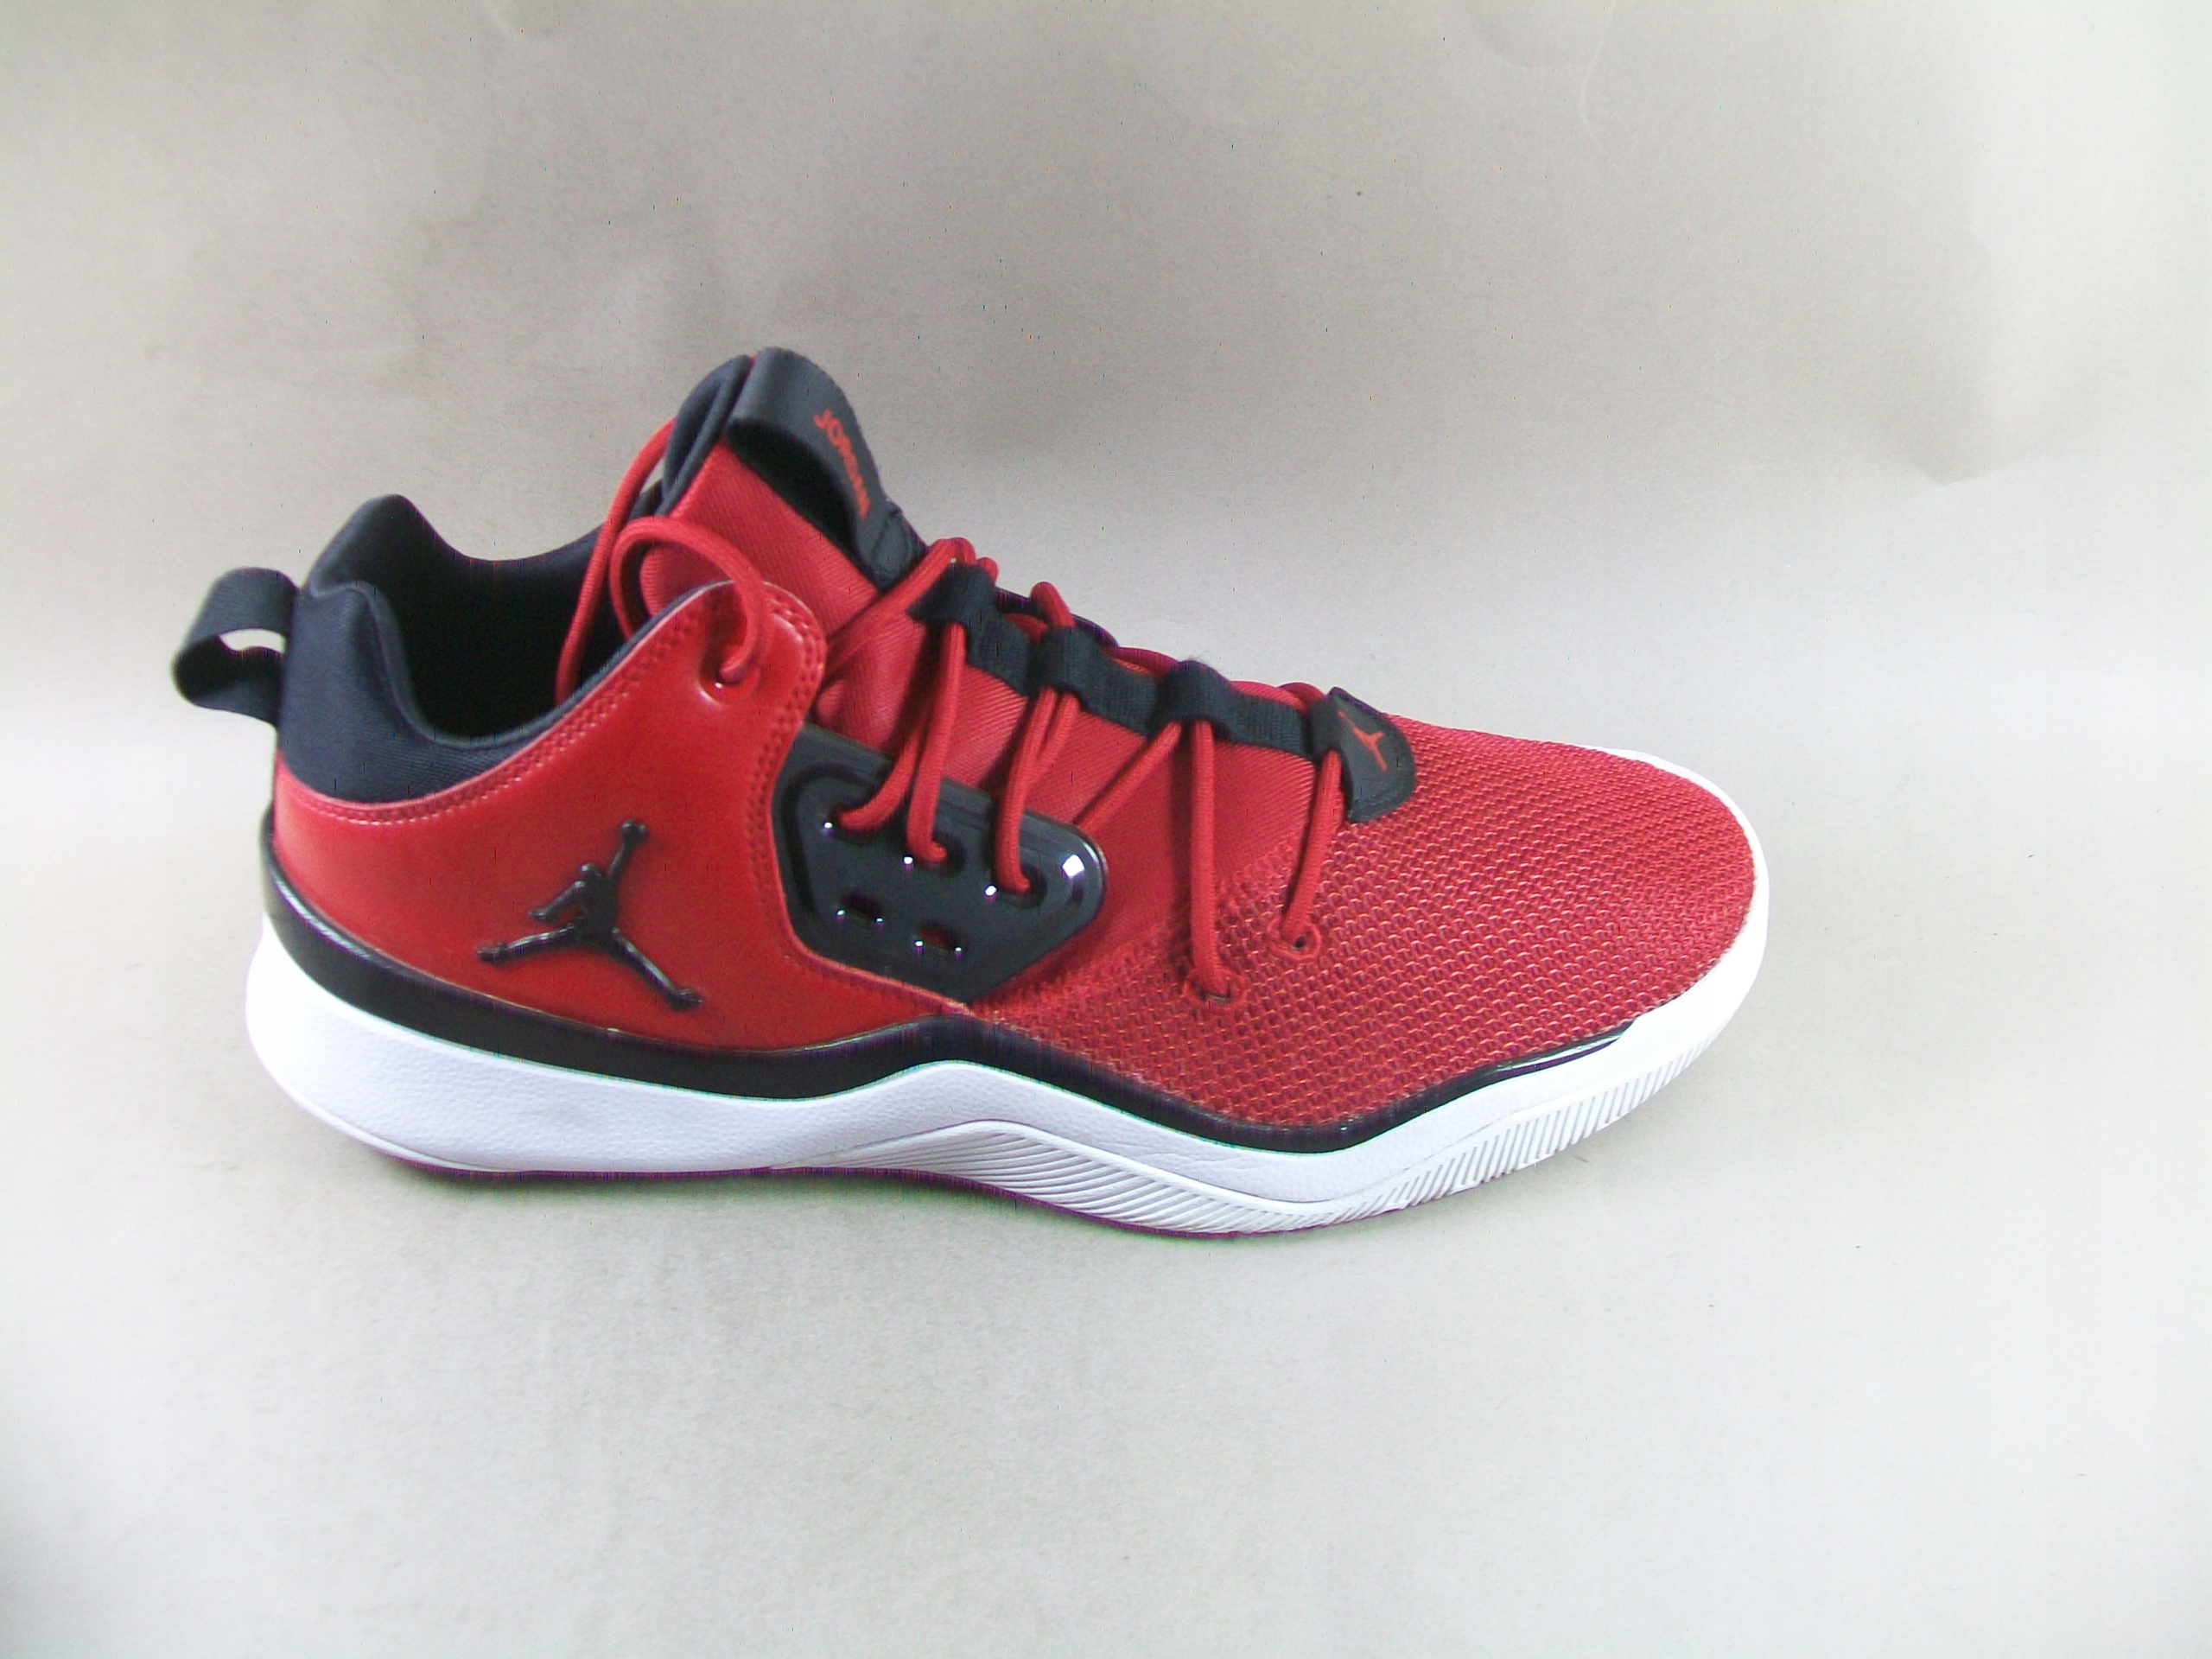 347200698078c Nike Jordan DNA Oryginalne roz. 45 - 7708549691 - oficjalne archiwum ...